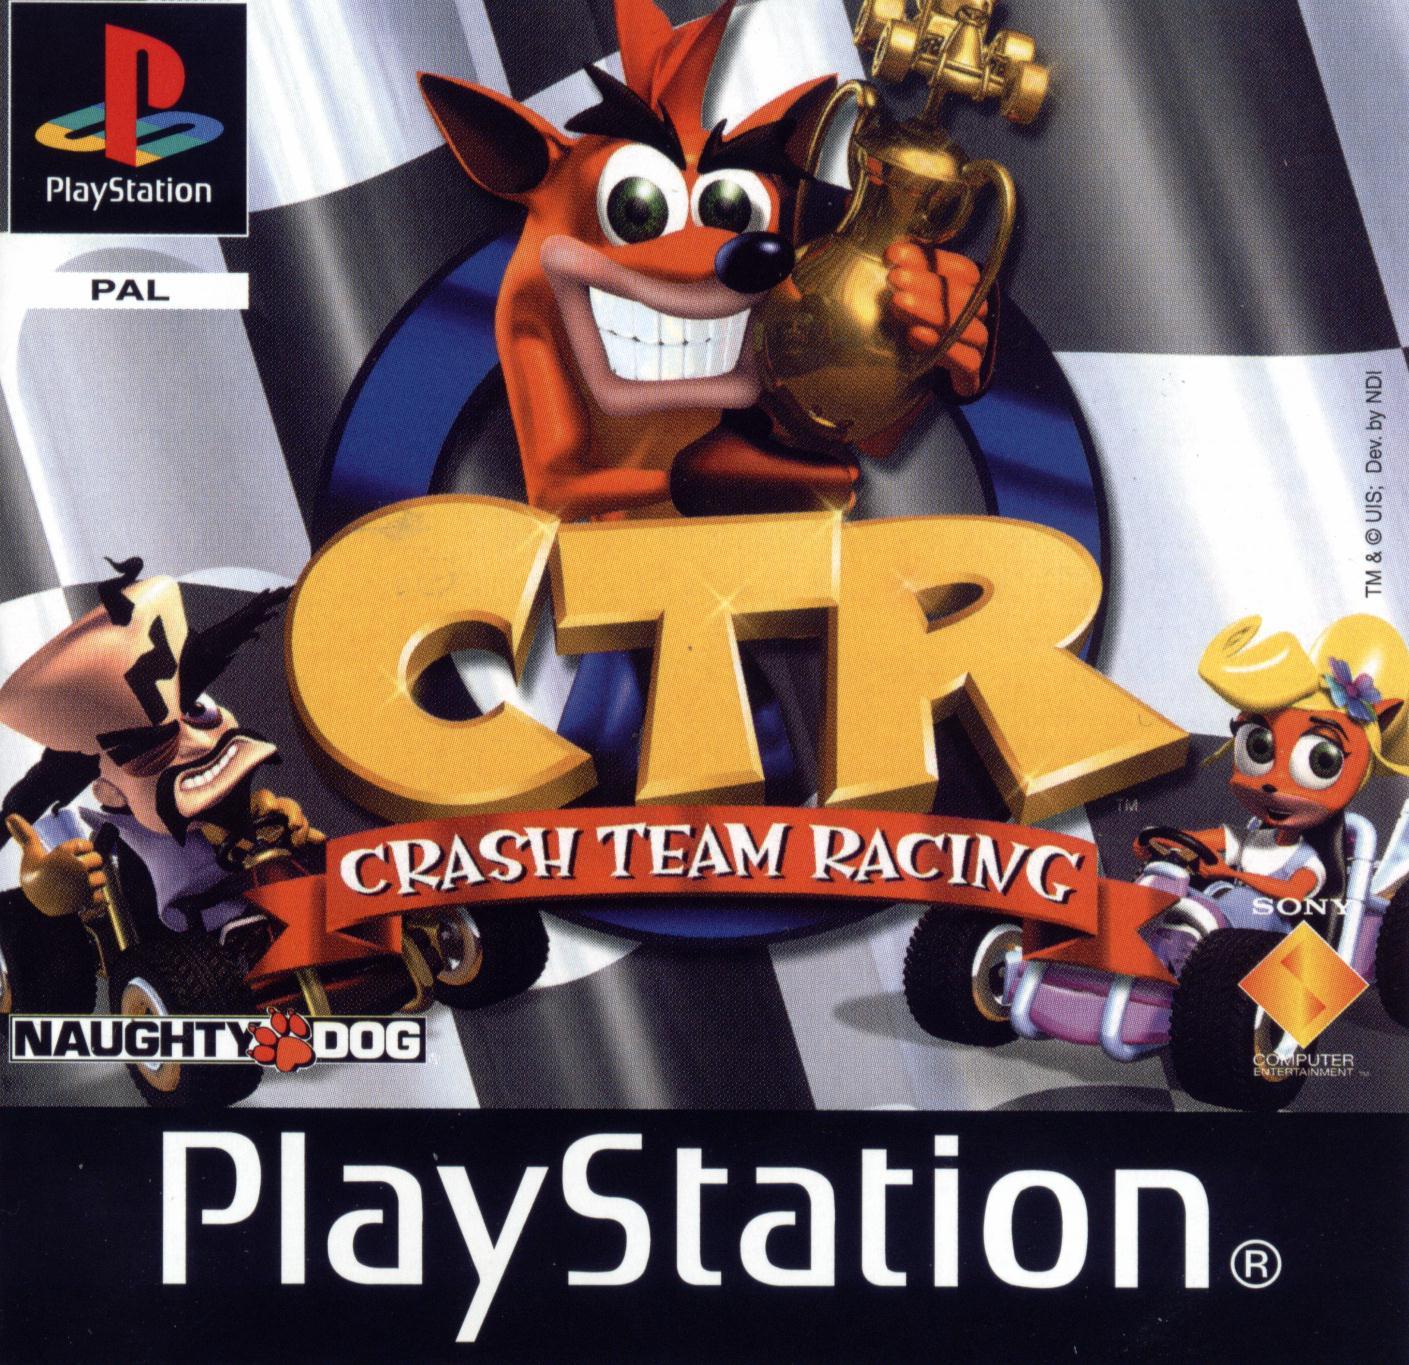 CRASH TEAM RACING (PS1)